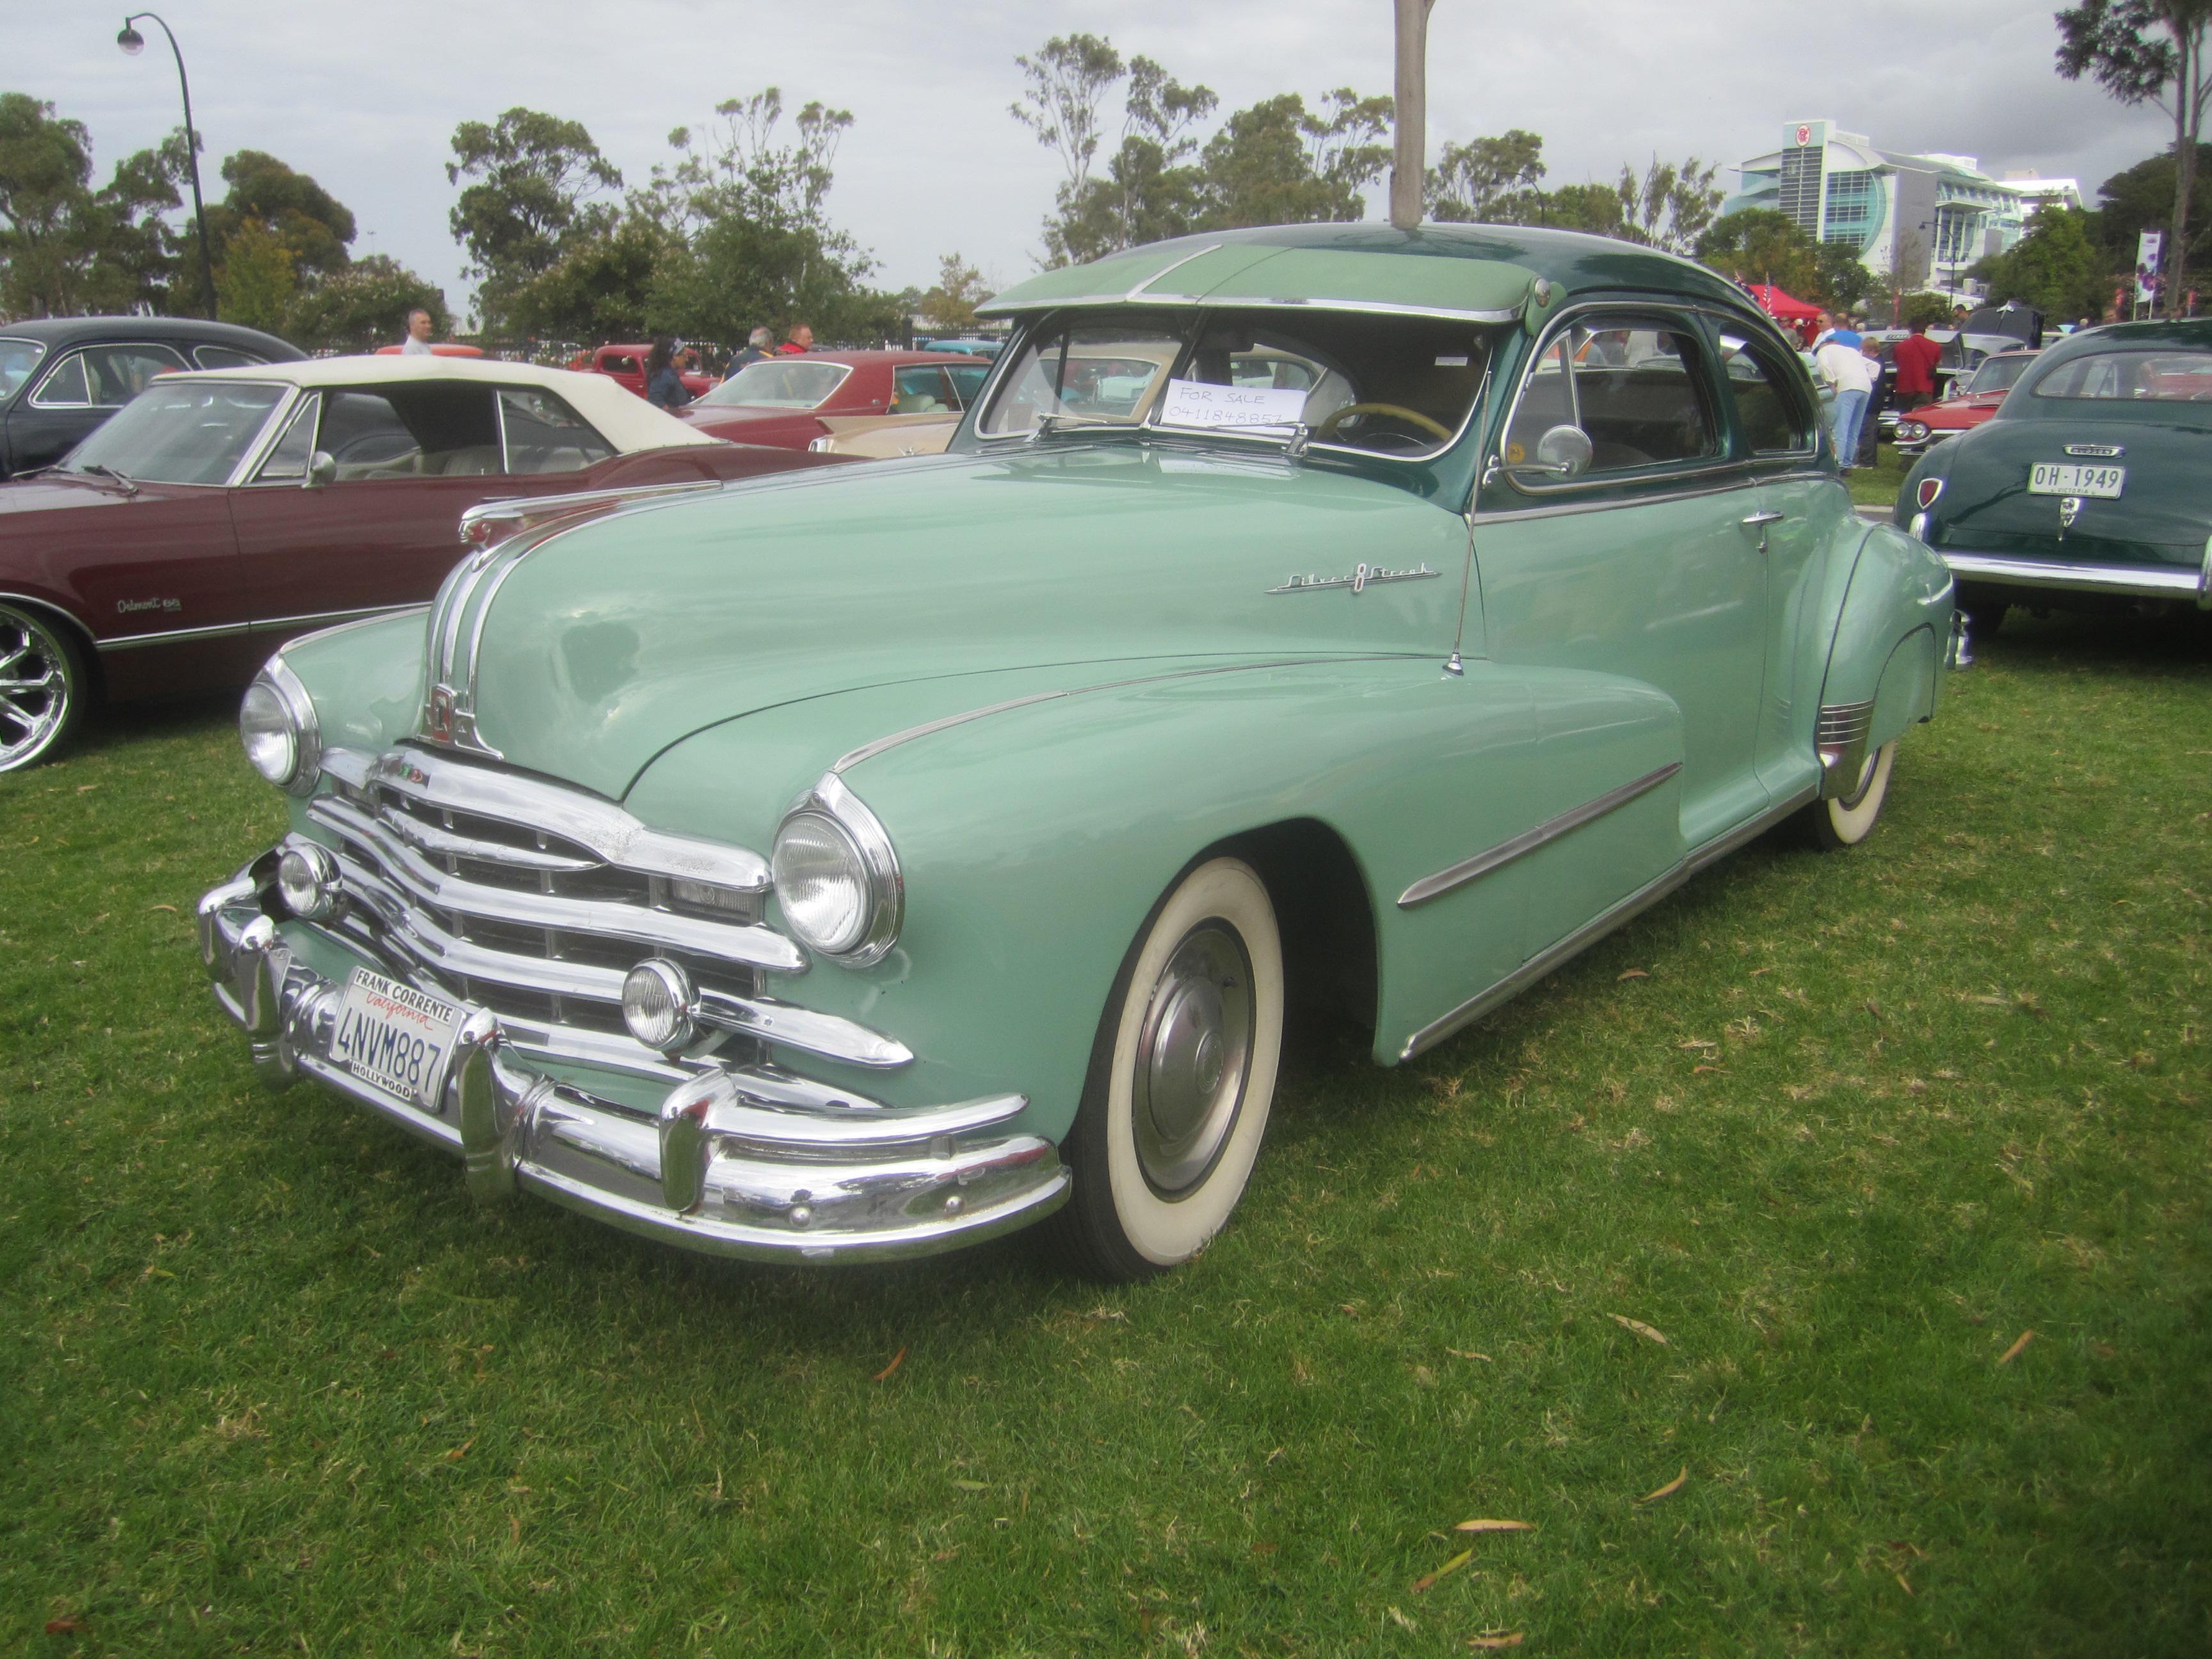 File:1948 Pontiac Streamliner Silver Streak Coupe.jpg - Wikimedia ...